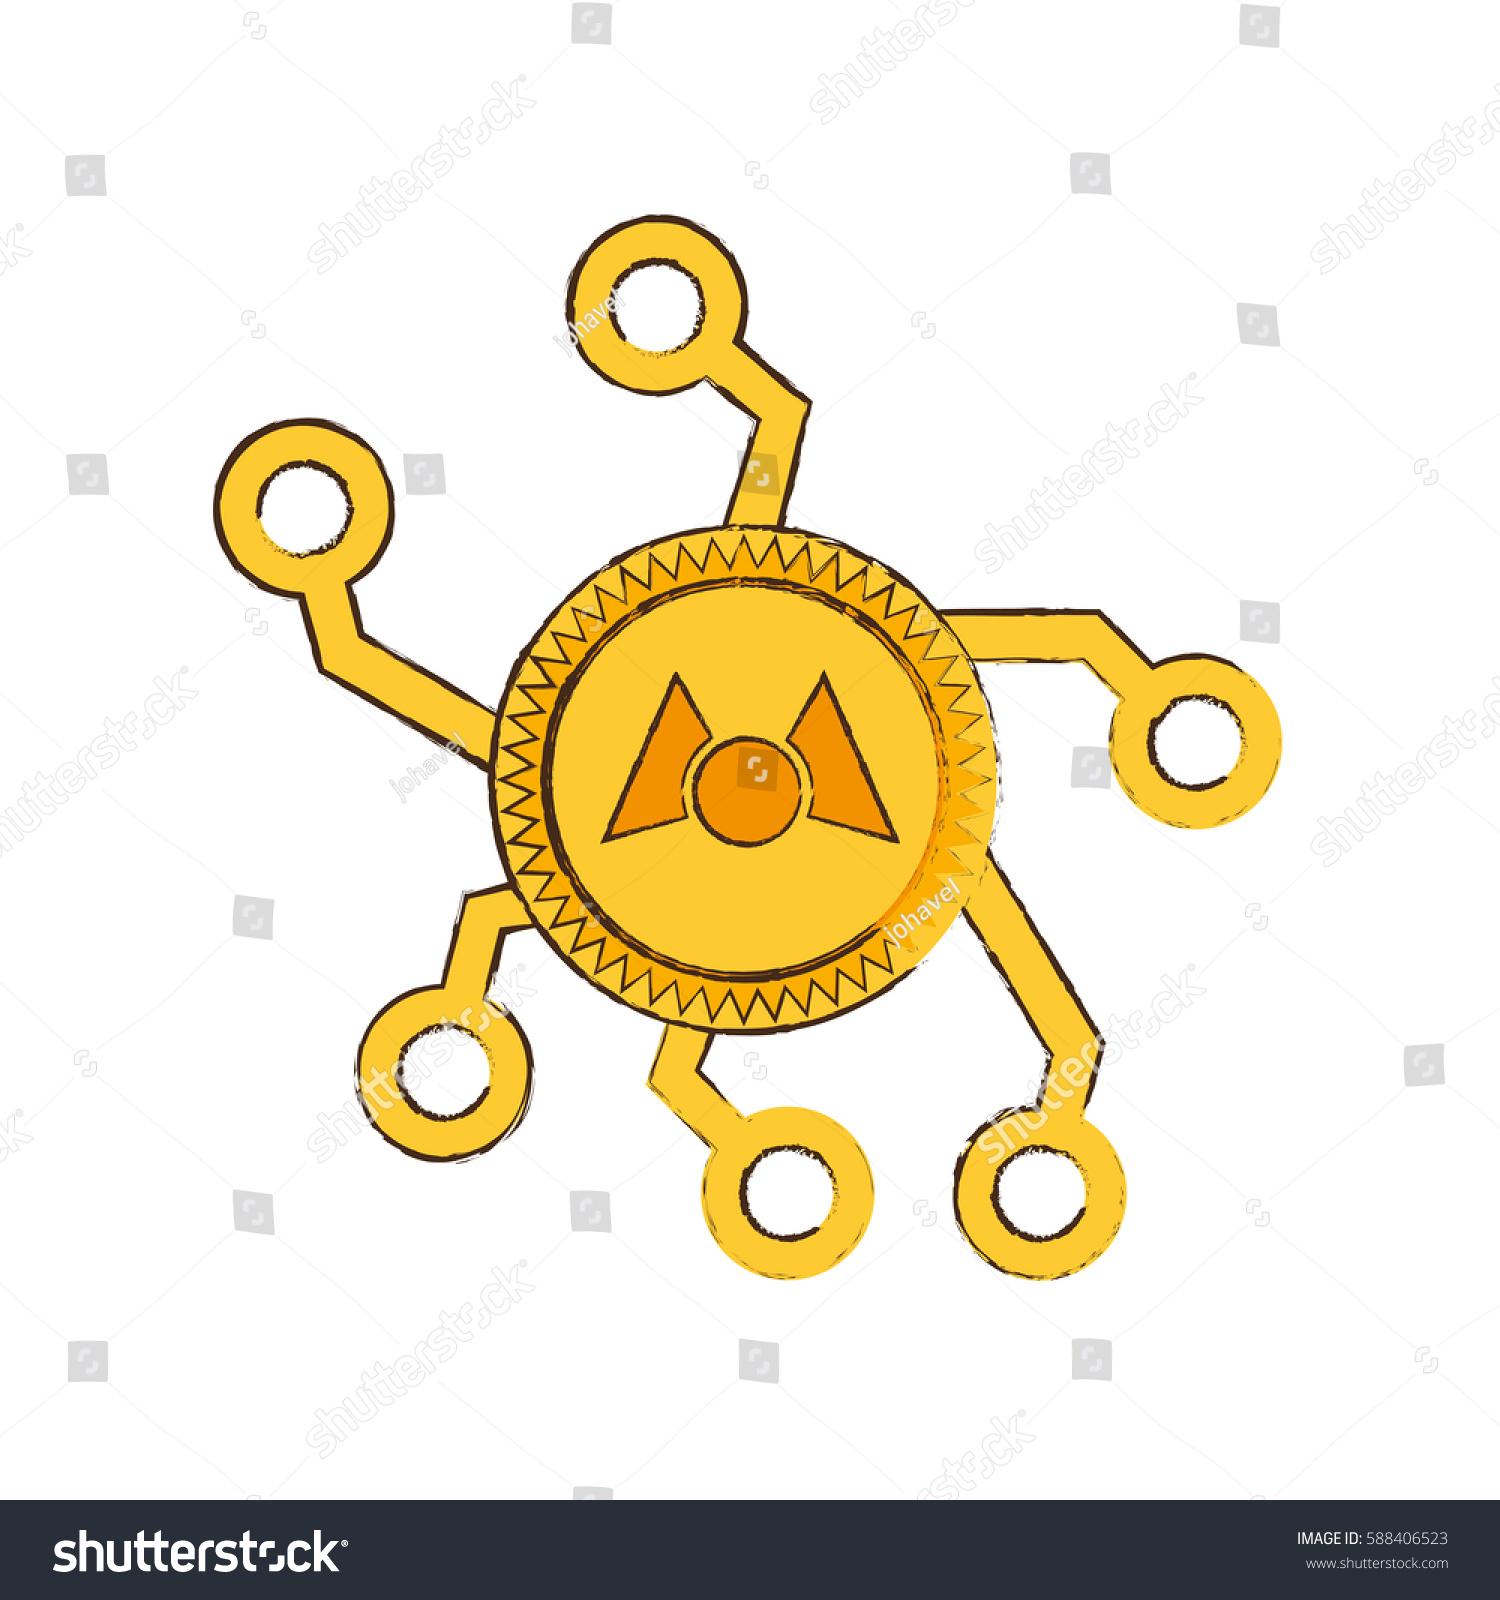 Drawing Mastercoin Web Icon Vector Illustration Stock Vector 588406523 - Shutterstock